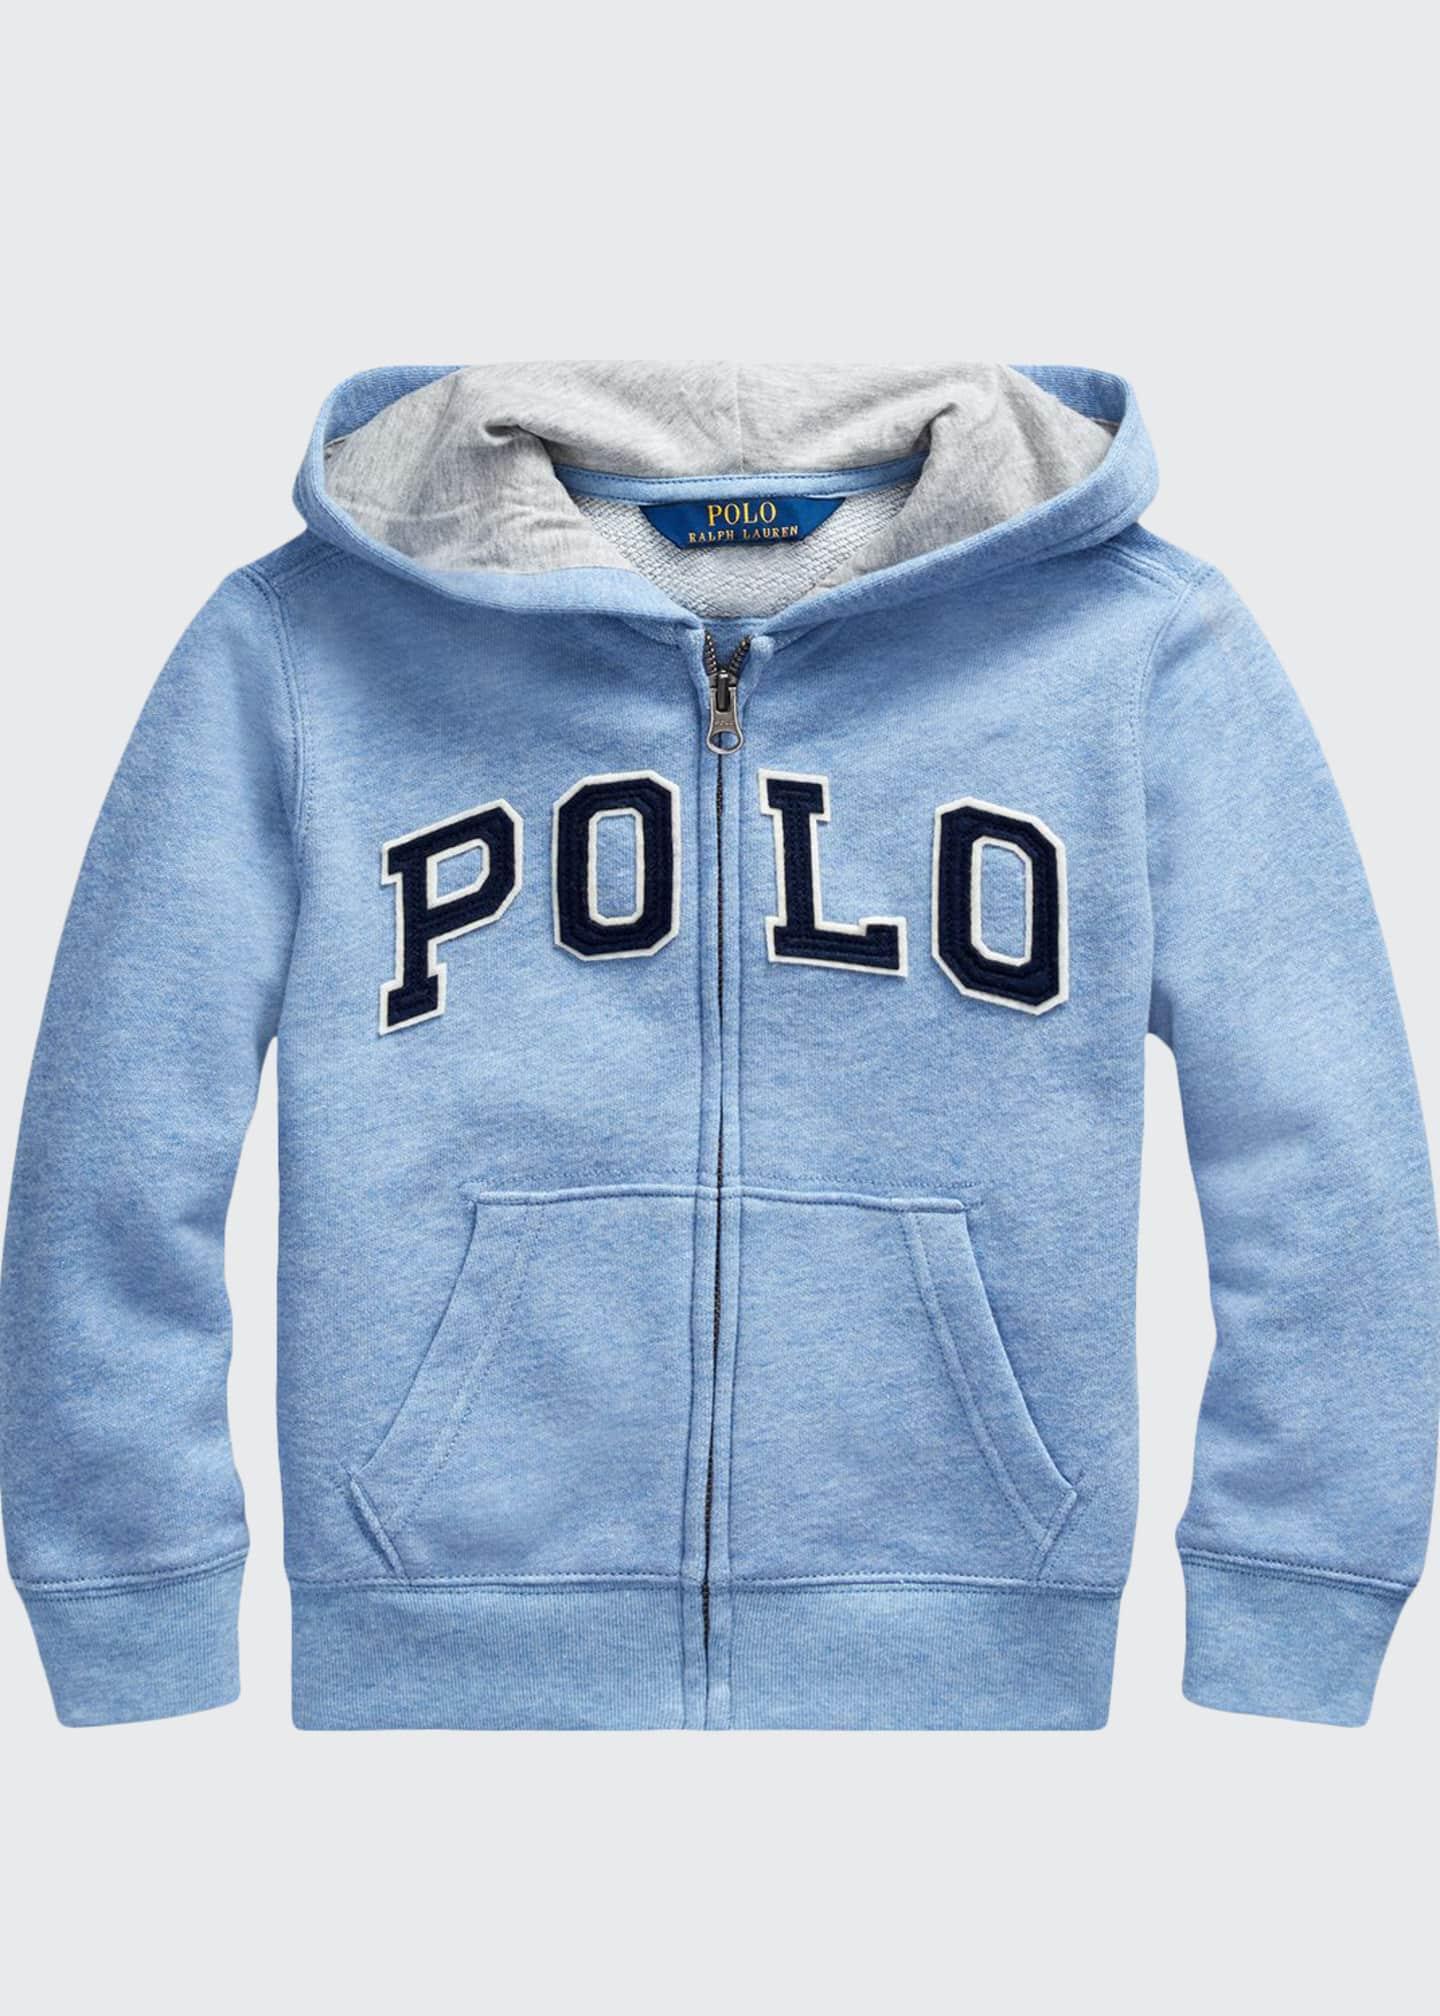 Ralph Lauren Childrenswear Boy's Polo Zip-Front Knit Jacket,